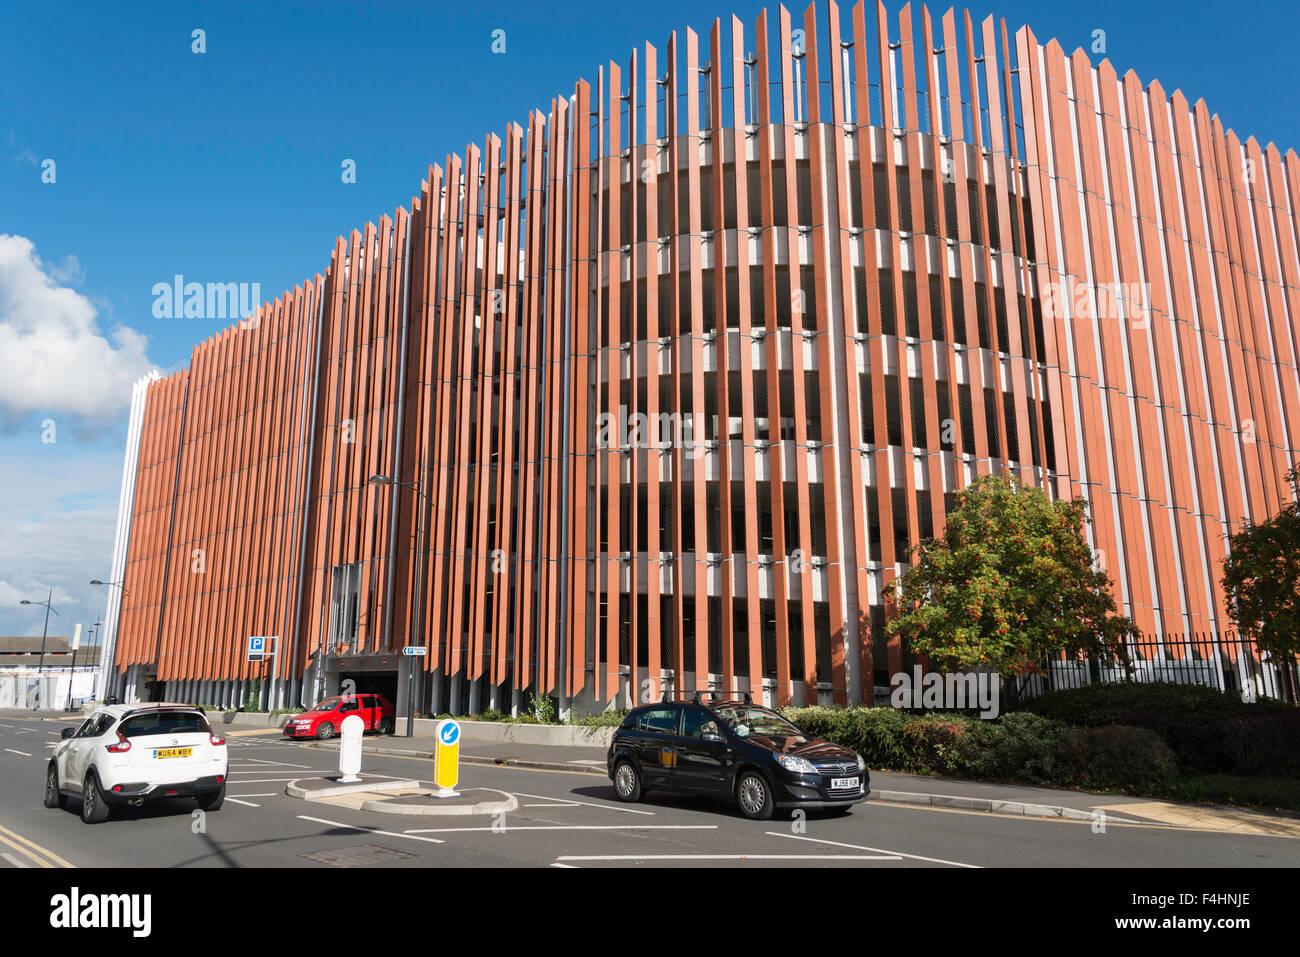 Whalebridge Car Parking building, Islington Street, Swindon, Wiltshire, England, United Kingdom - Stock Image